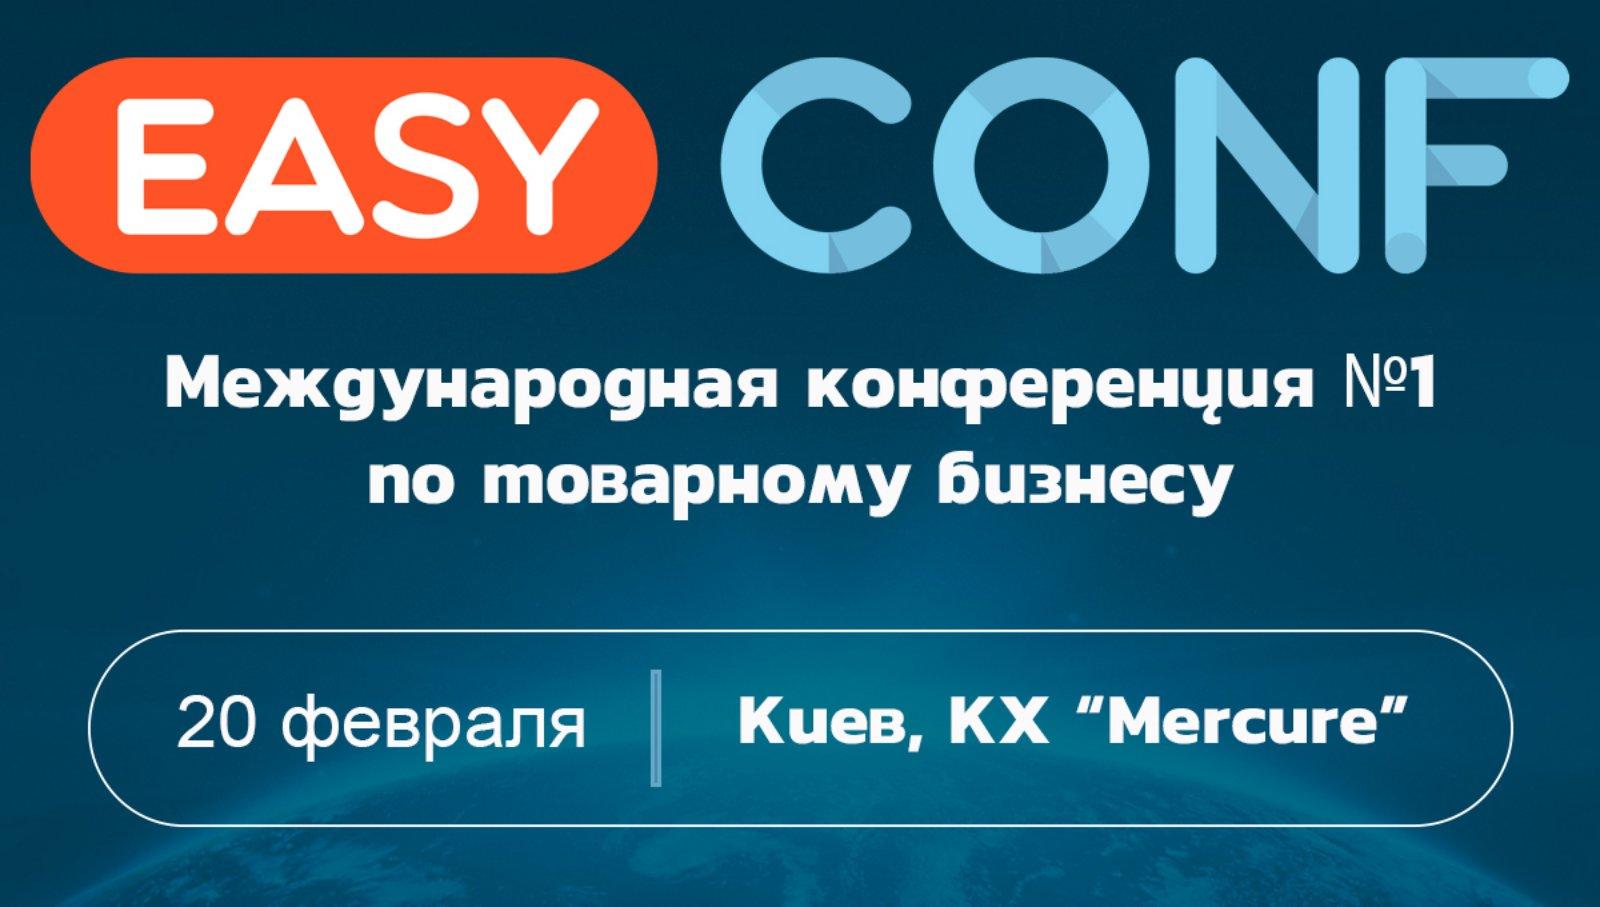 Новости Днепра про Самая масштабная товарная конференция Украины «EasyConf»